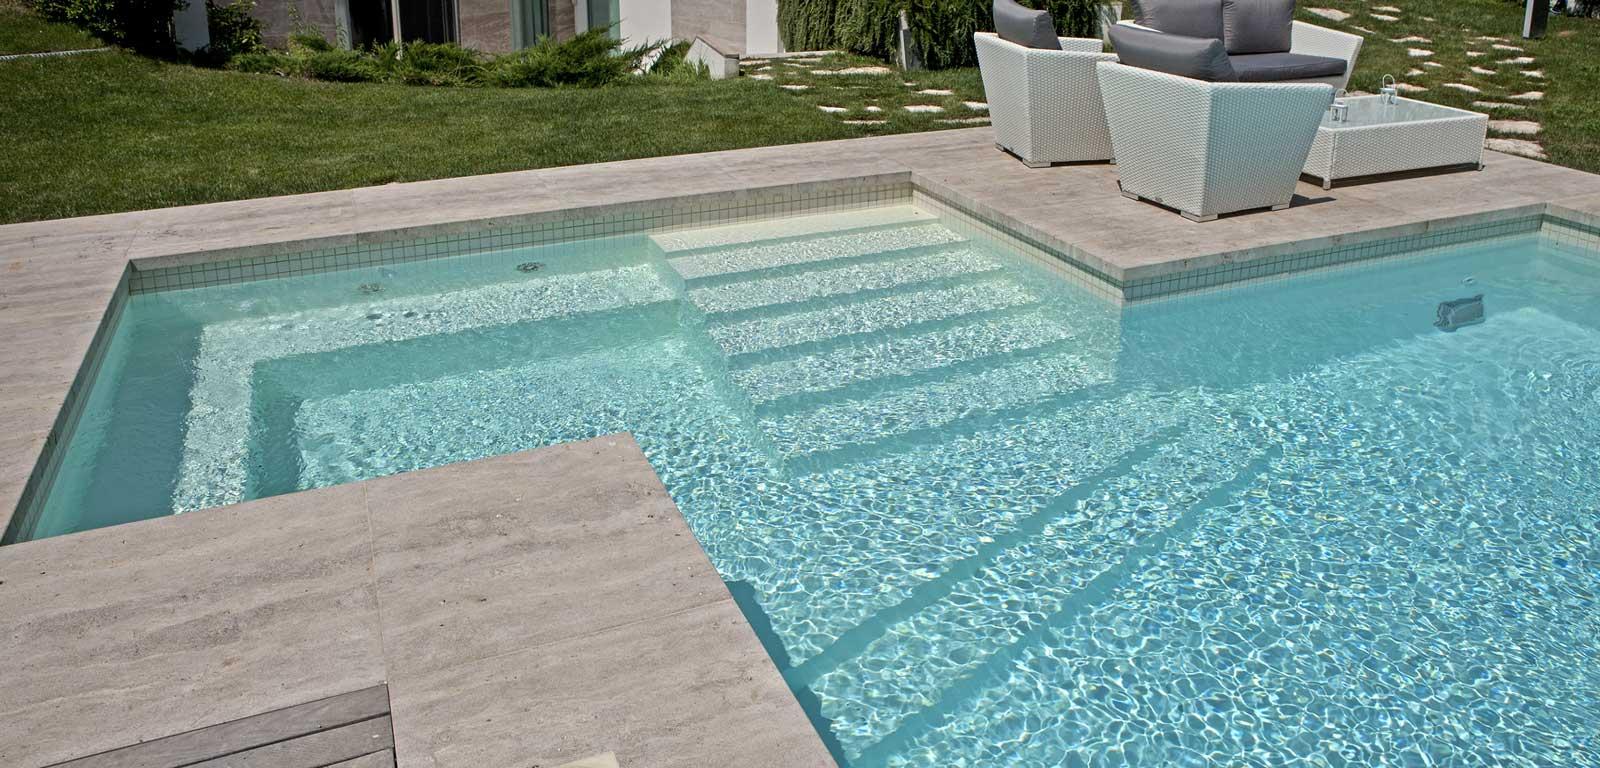 scala-ingresso-piscina-interna